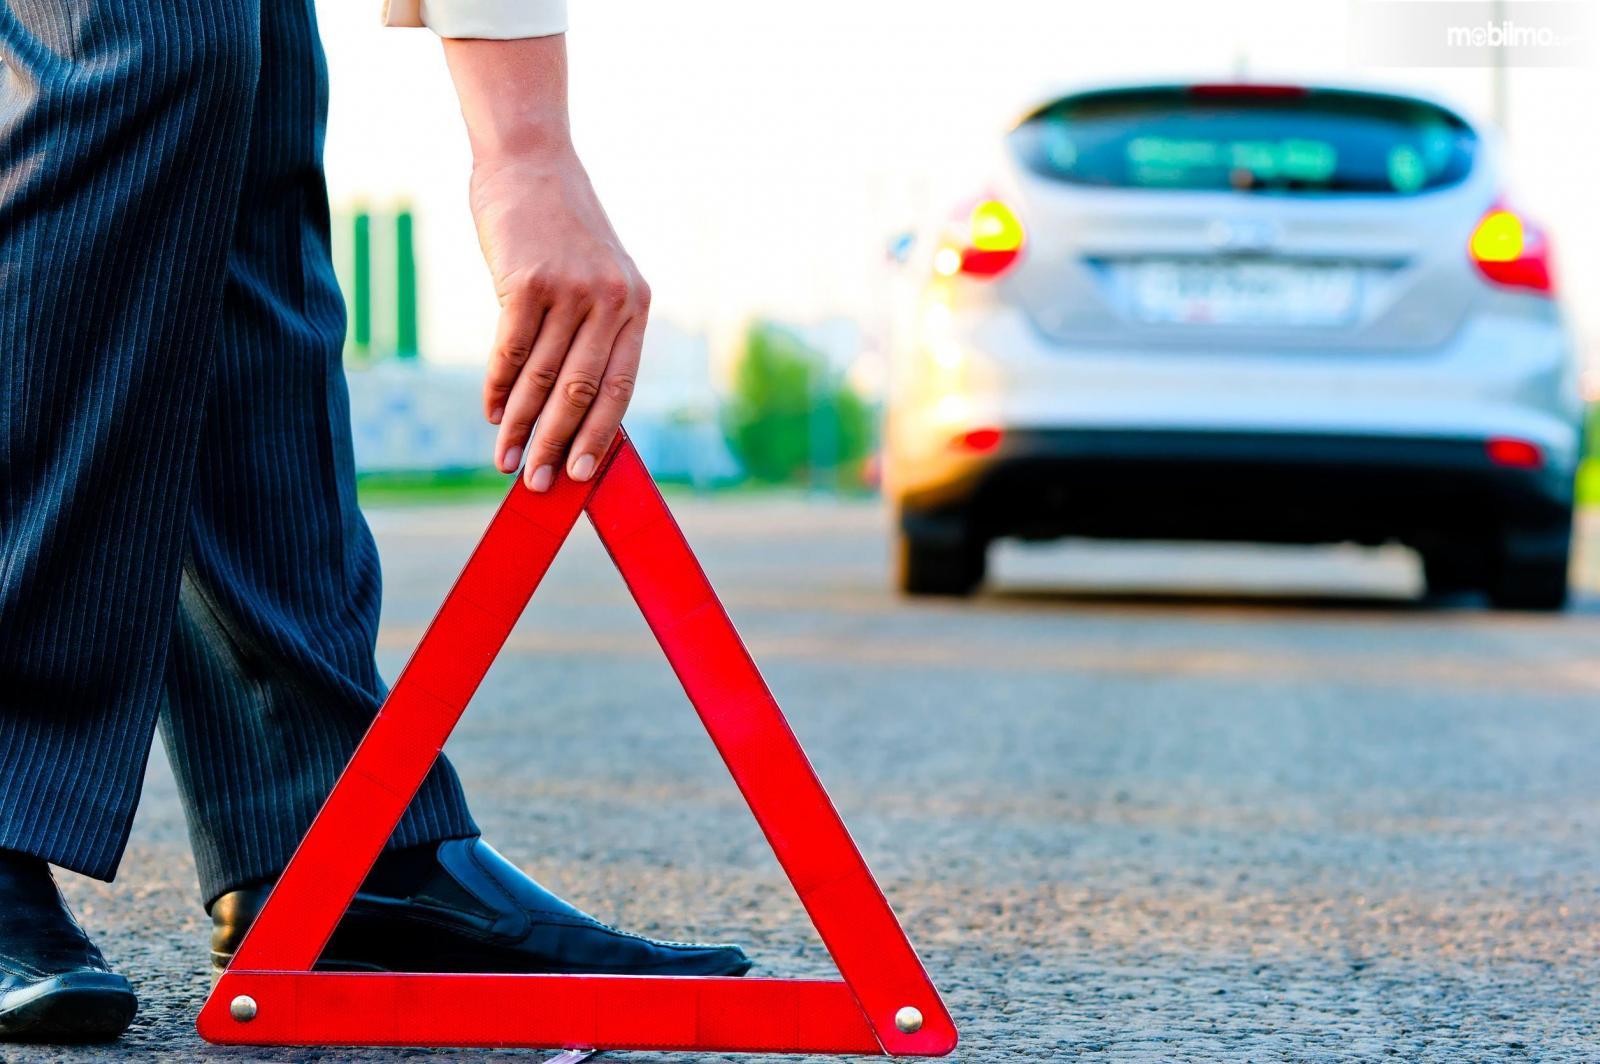 Foto mobil mogok menyalakan lampu hazard